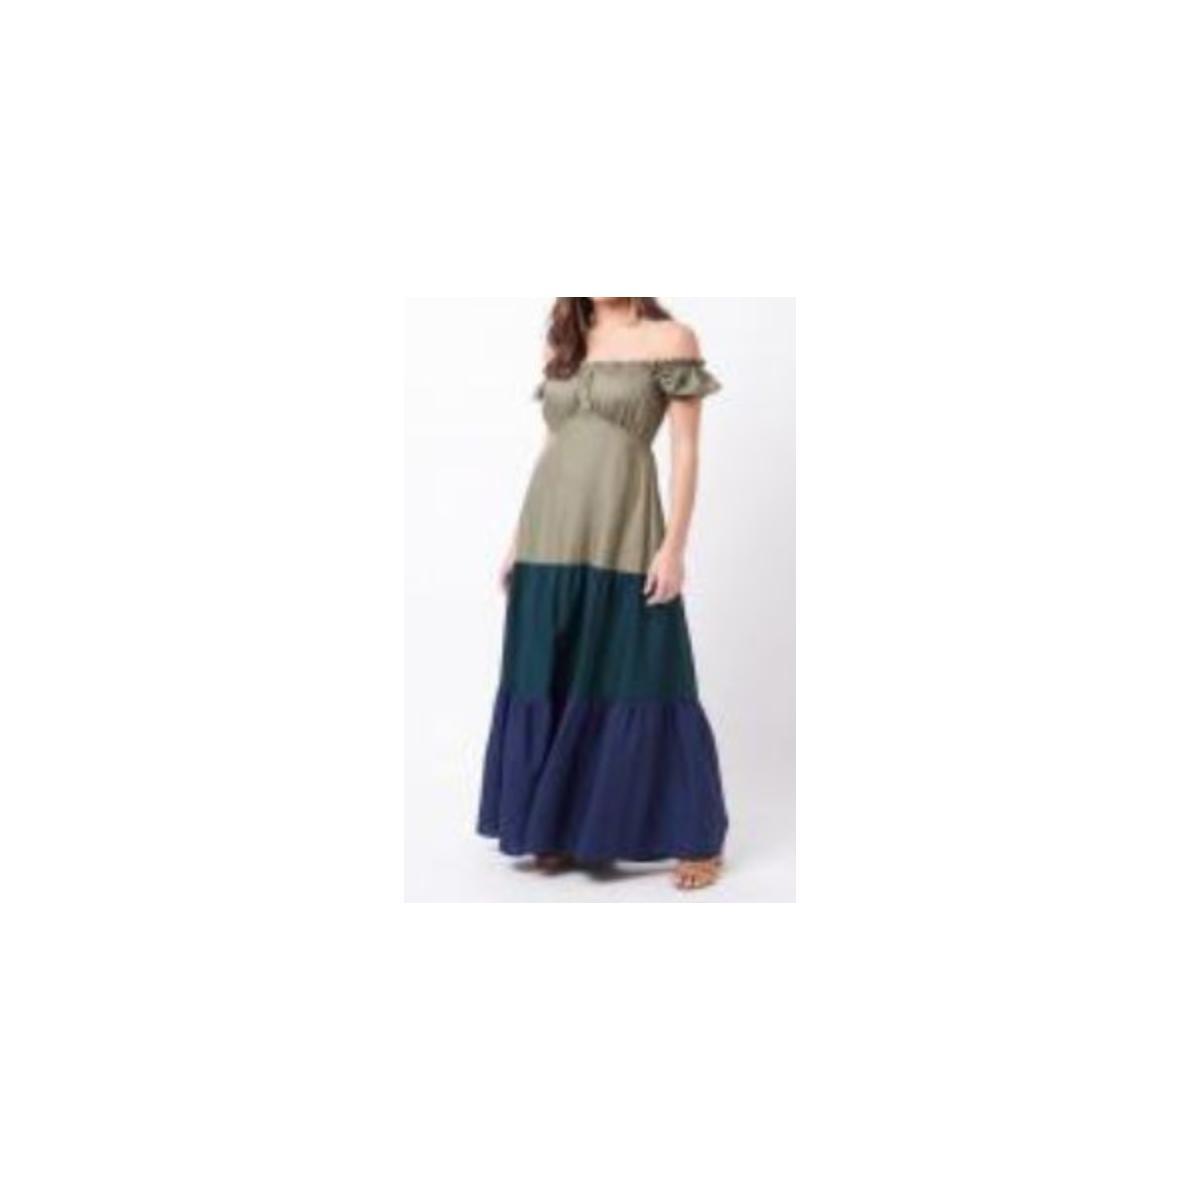 Vestido Feminino Mercatto 2837188 113 Verde/marinho